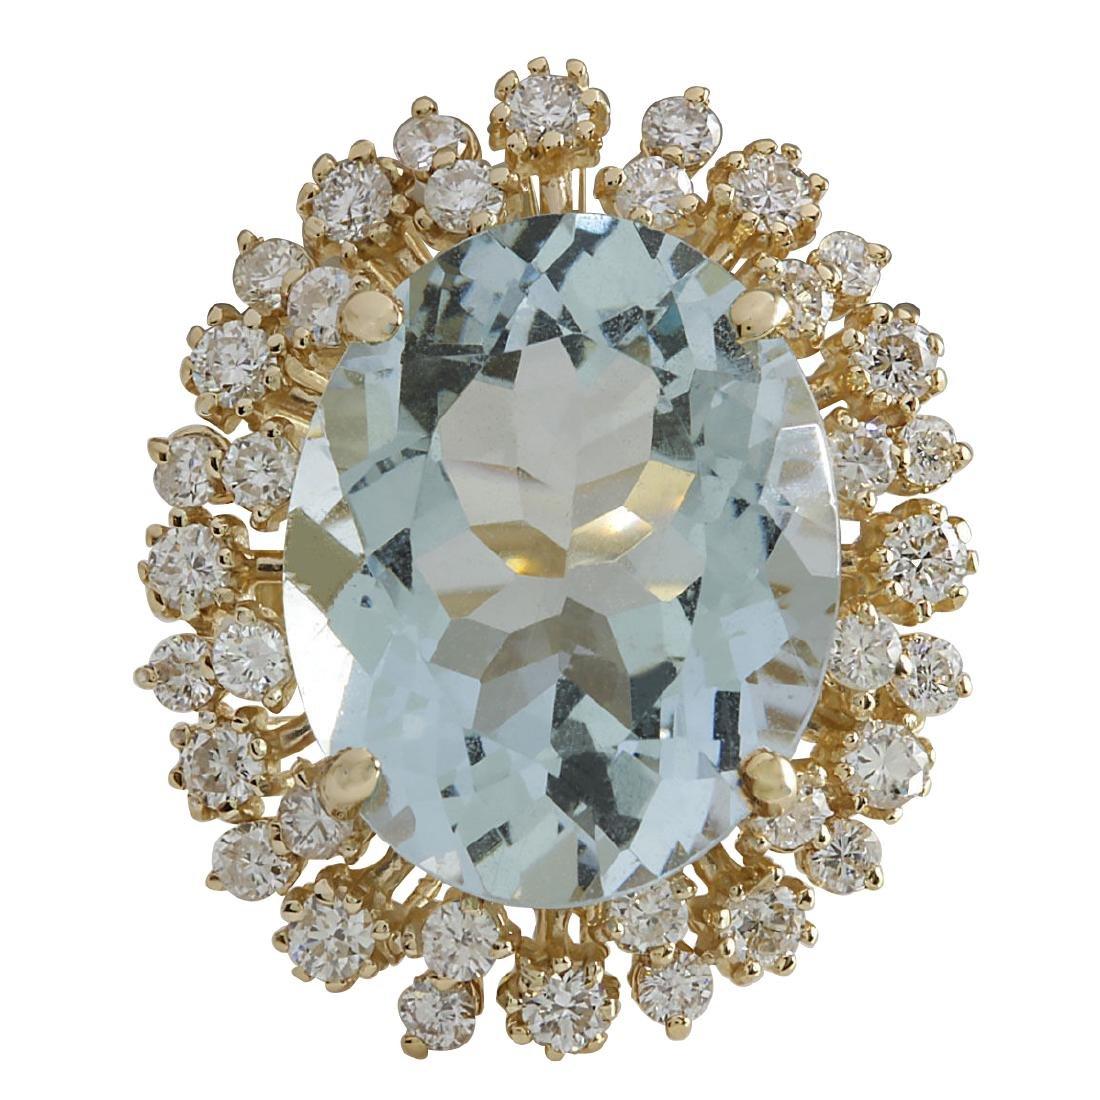 13.65CTW Natural Aquamarine And Diamond Ring In 18K